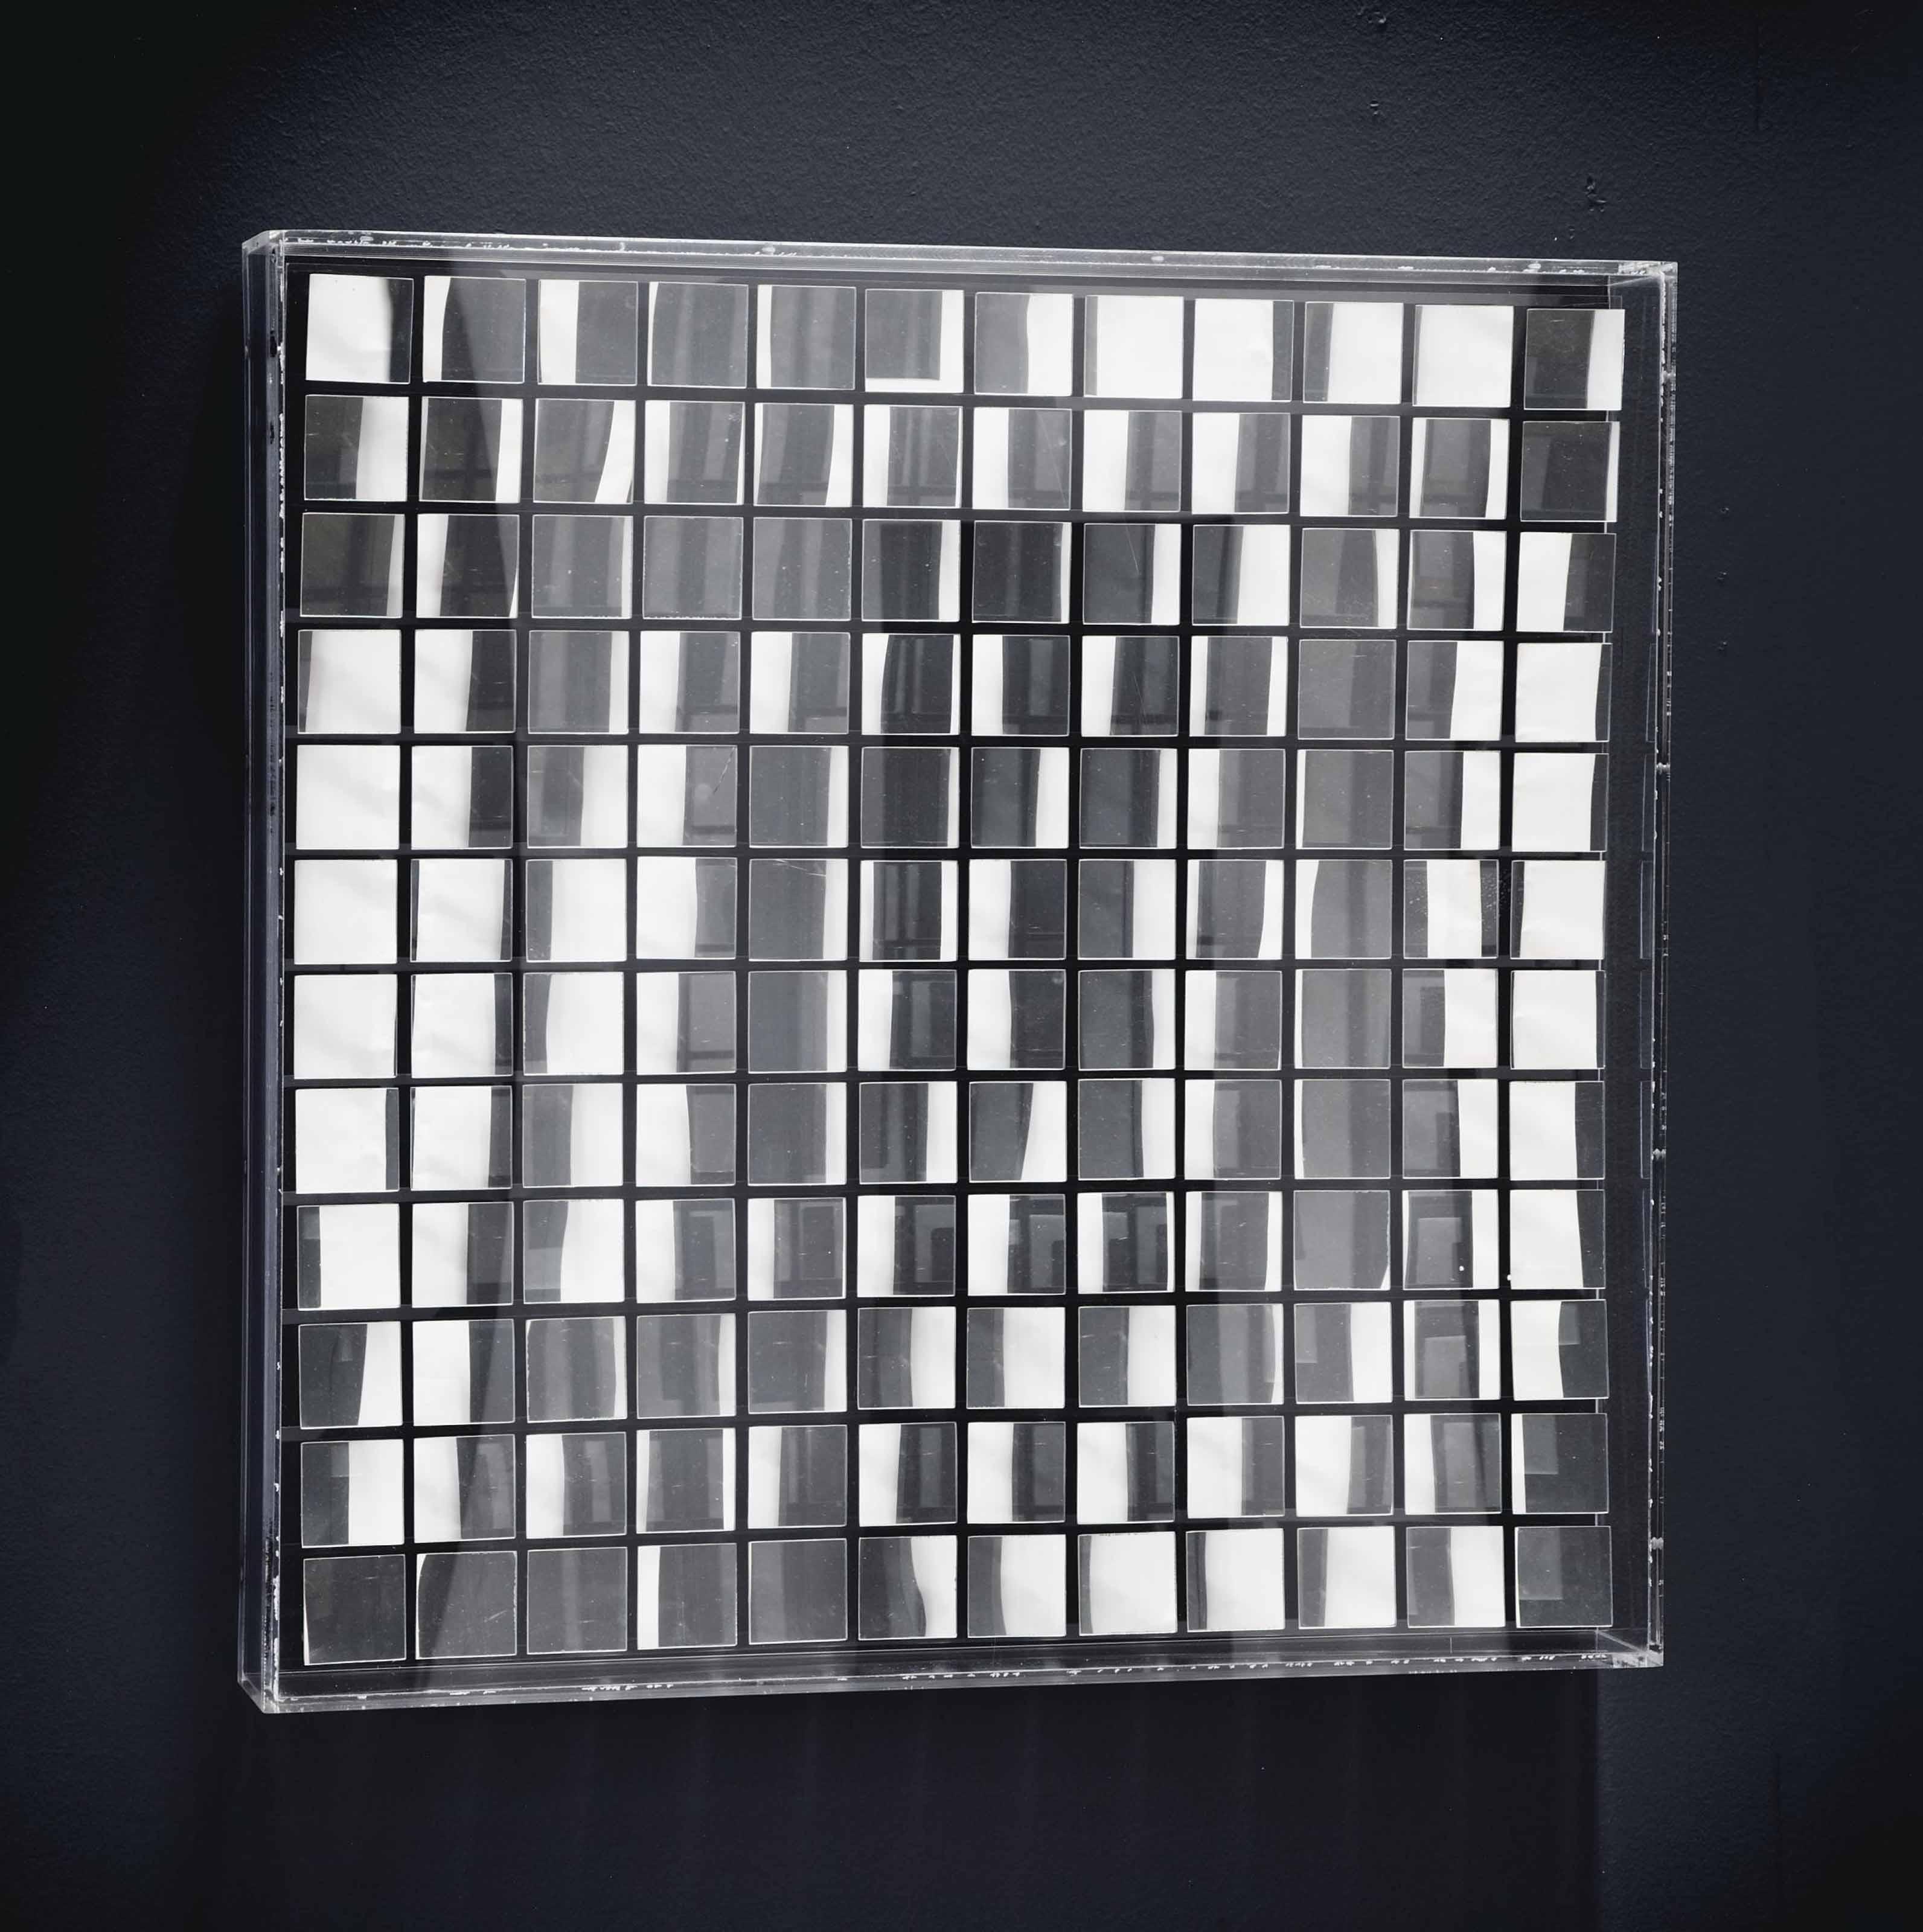 Quadrat im Quadrat (Hohlspiegelobjekt)